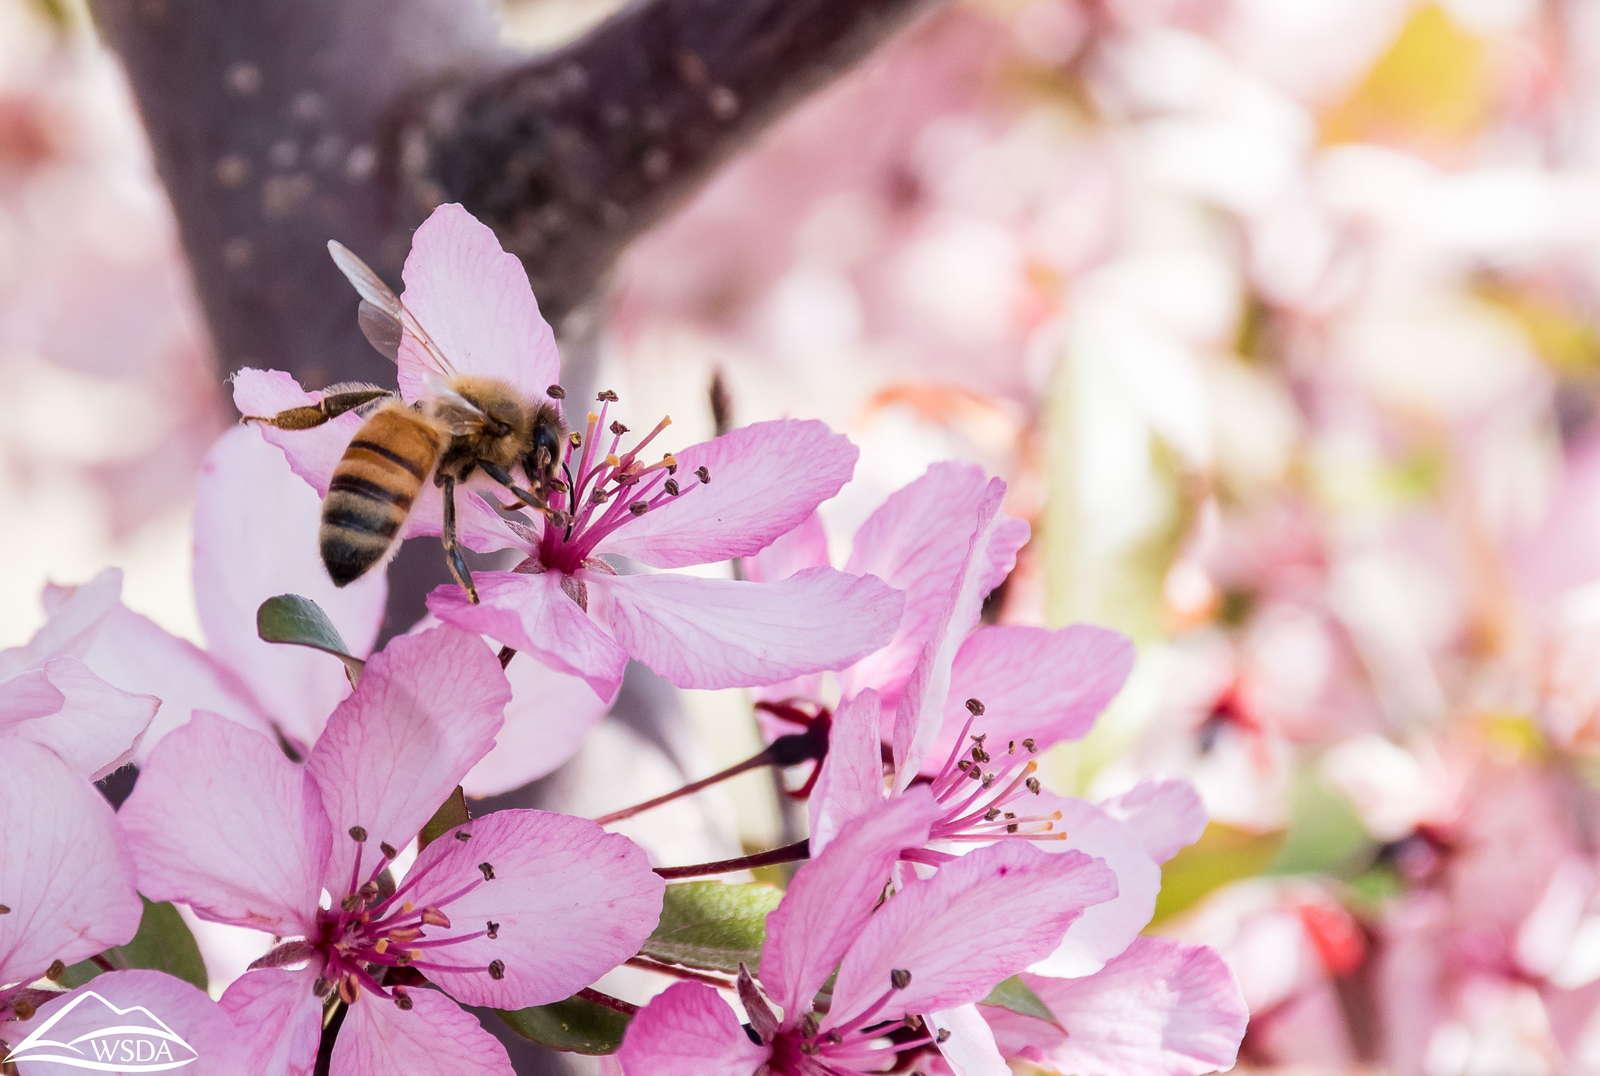 rosa Apfelblüte mit Biene